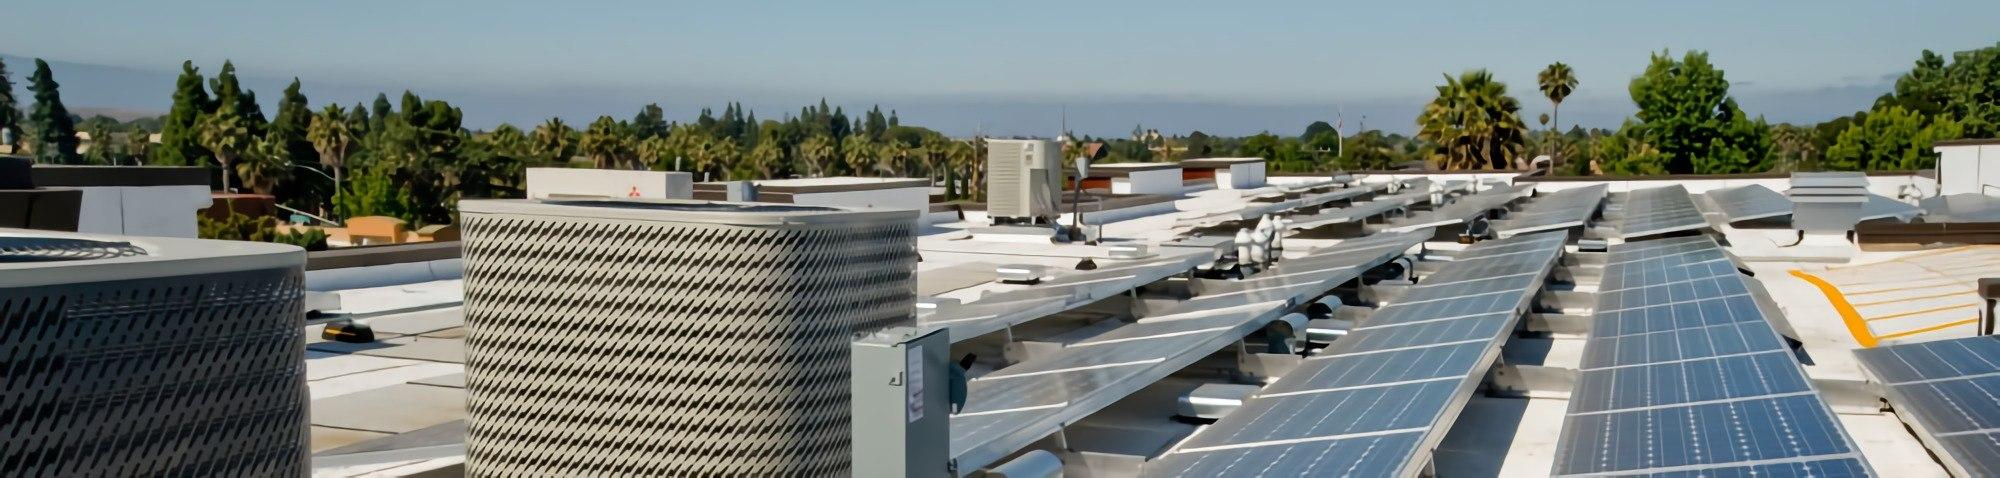 HVAC training in Jacksonville Florida